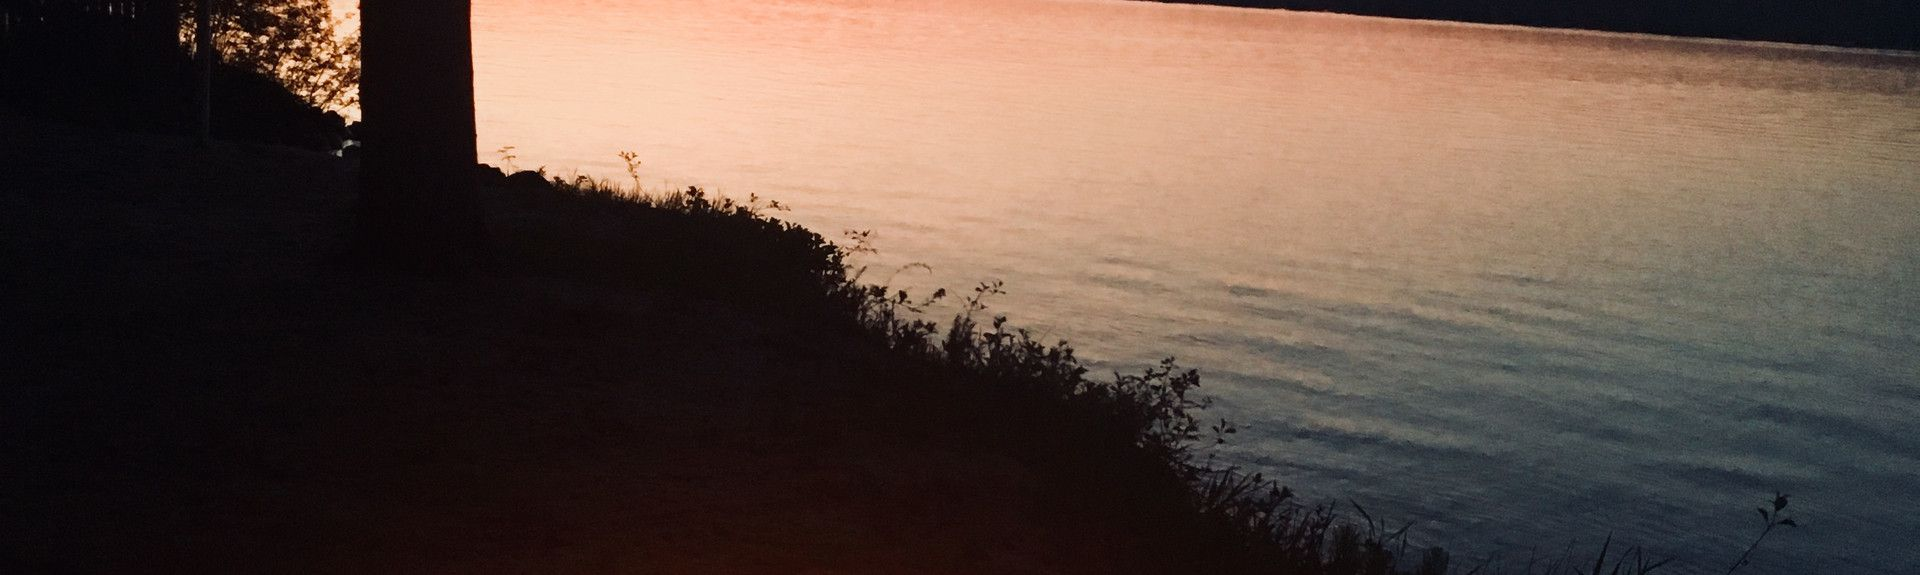 Lake Bellaire, Michigan, USA